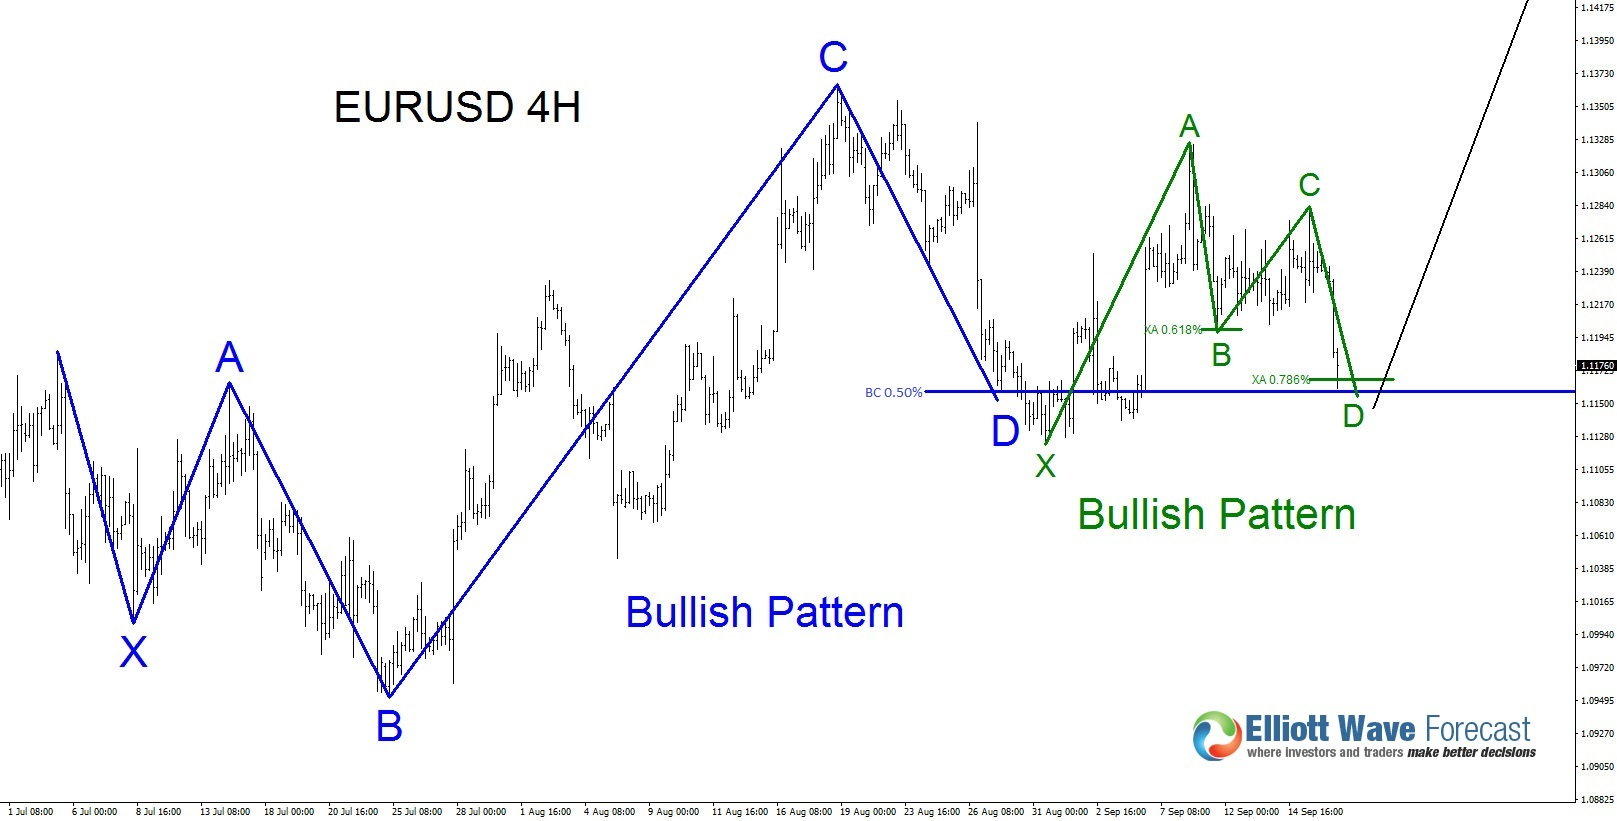 EURUSD Bullish Patterns?